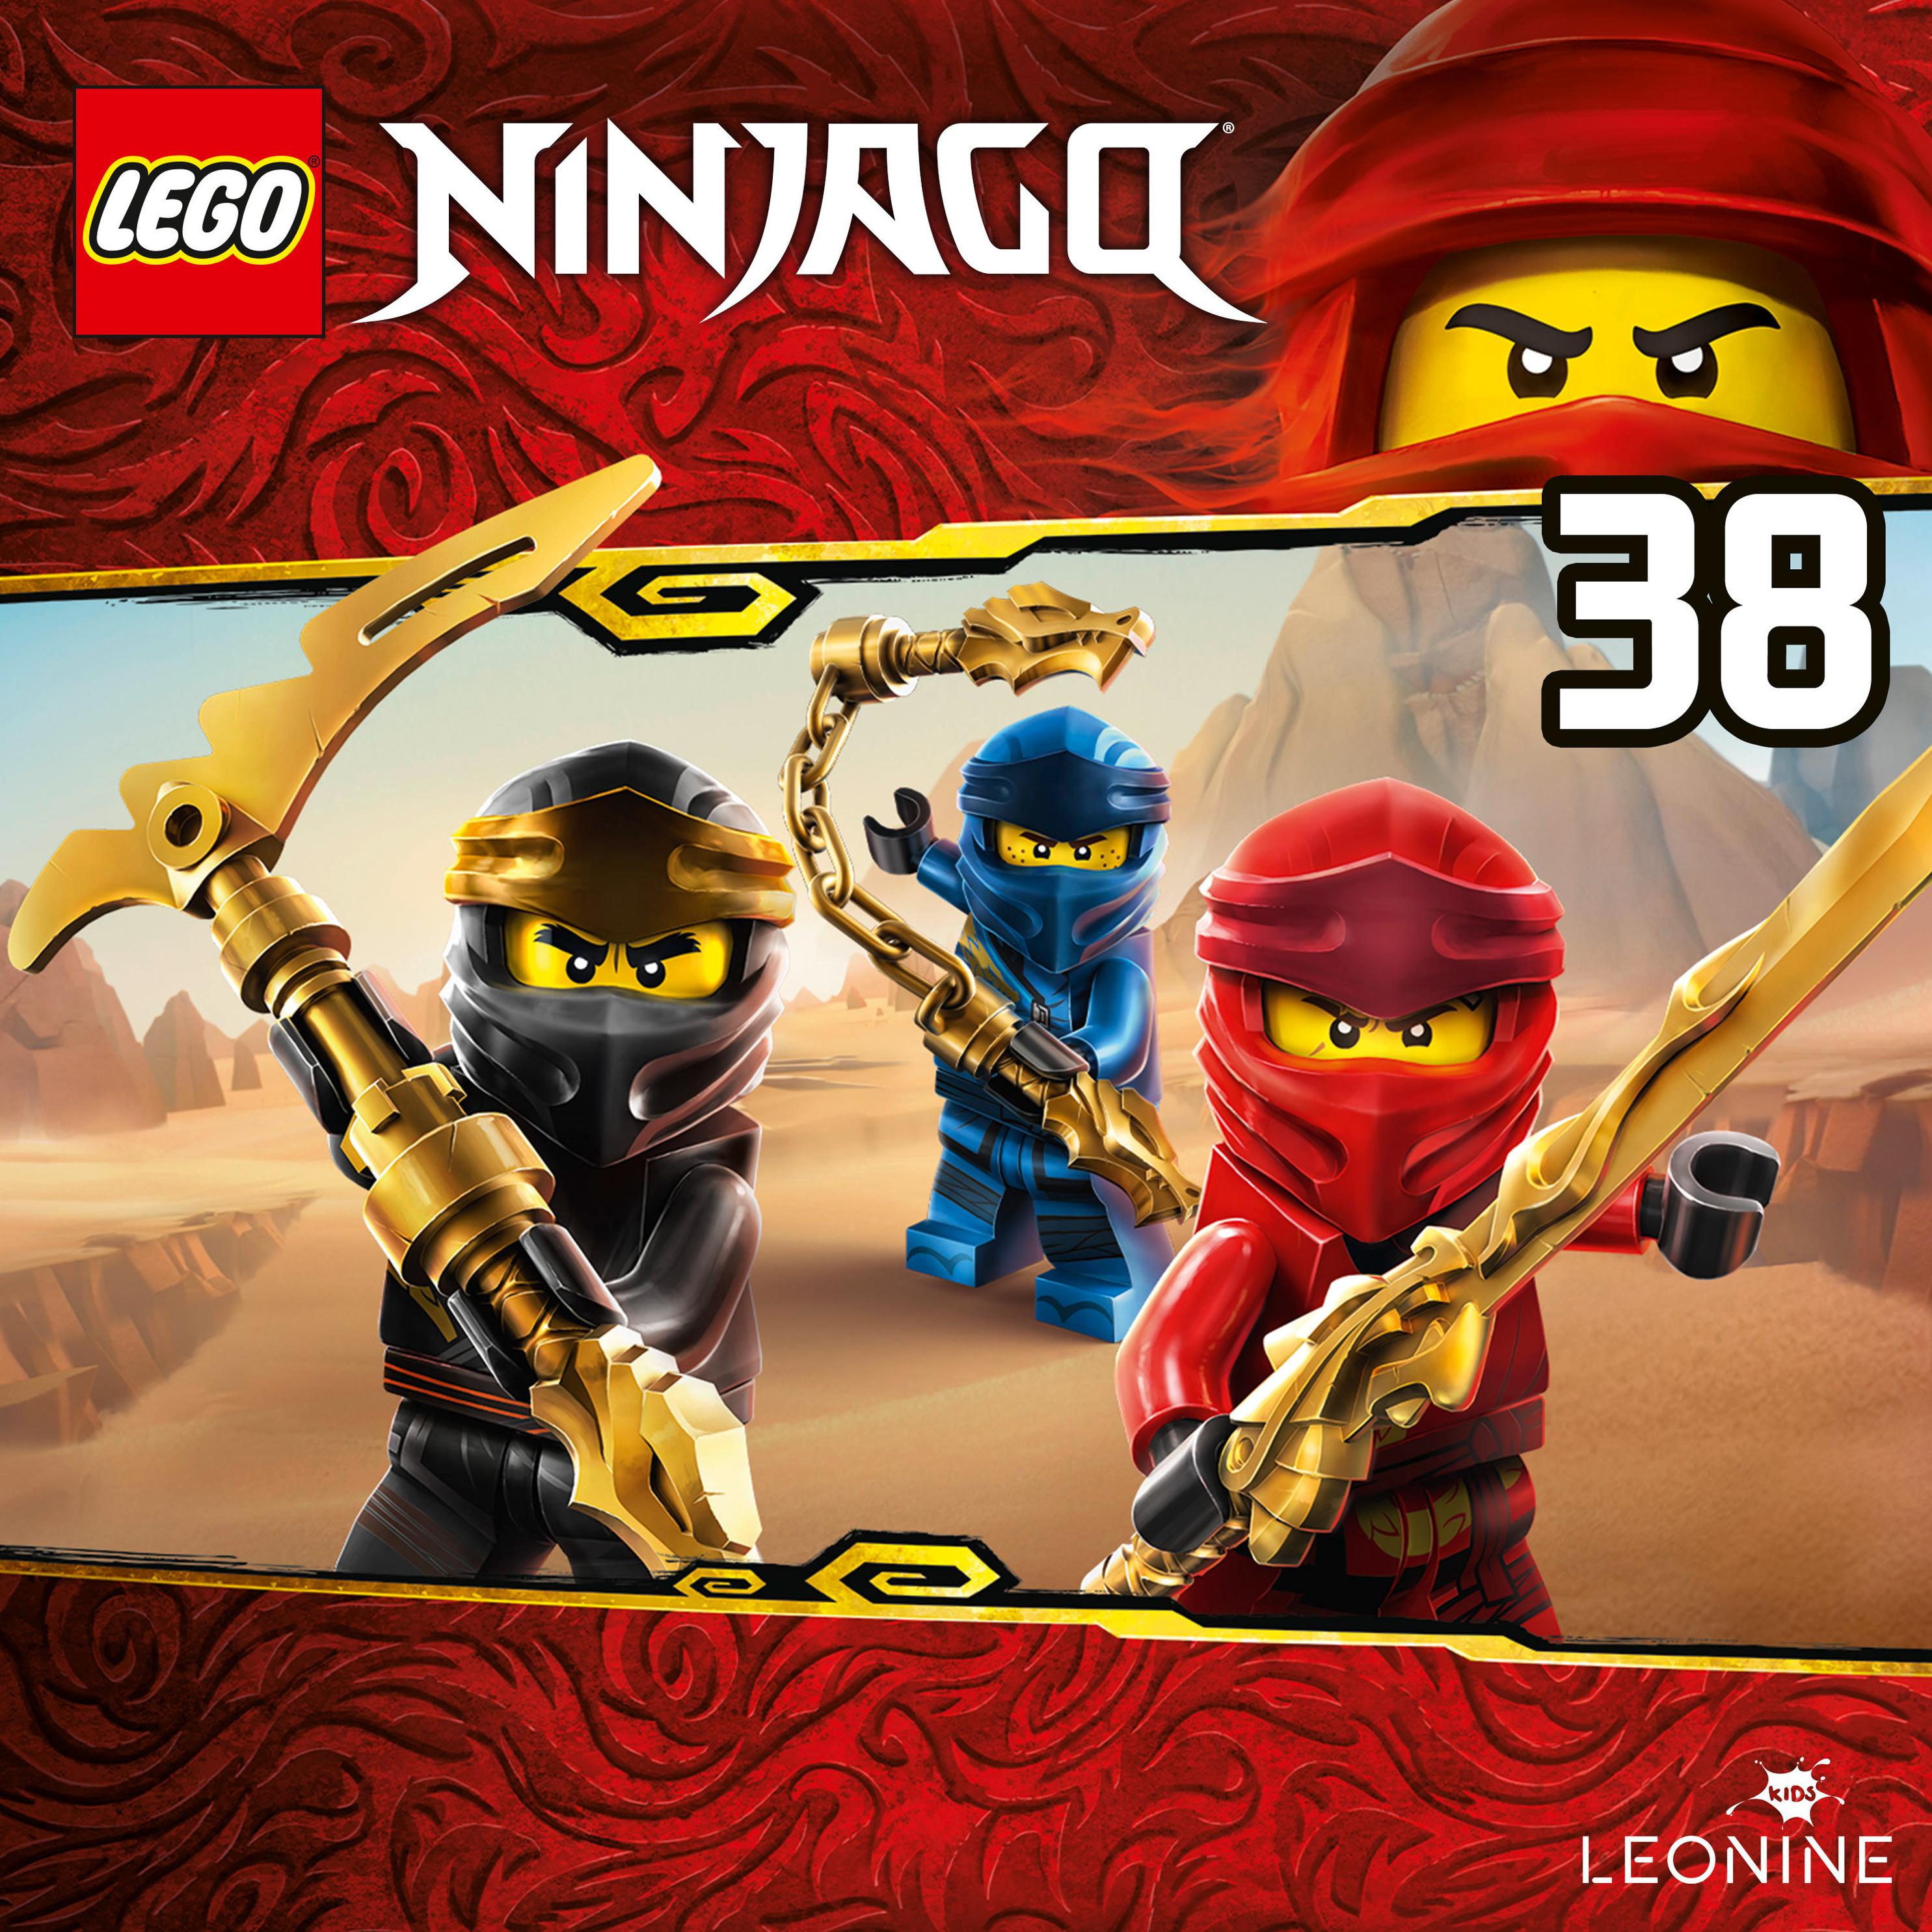 lego ninjago folgen 97 98 der sturz 298542078